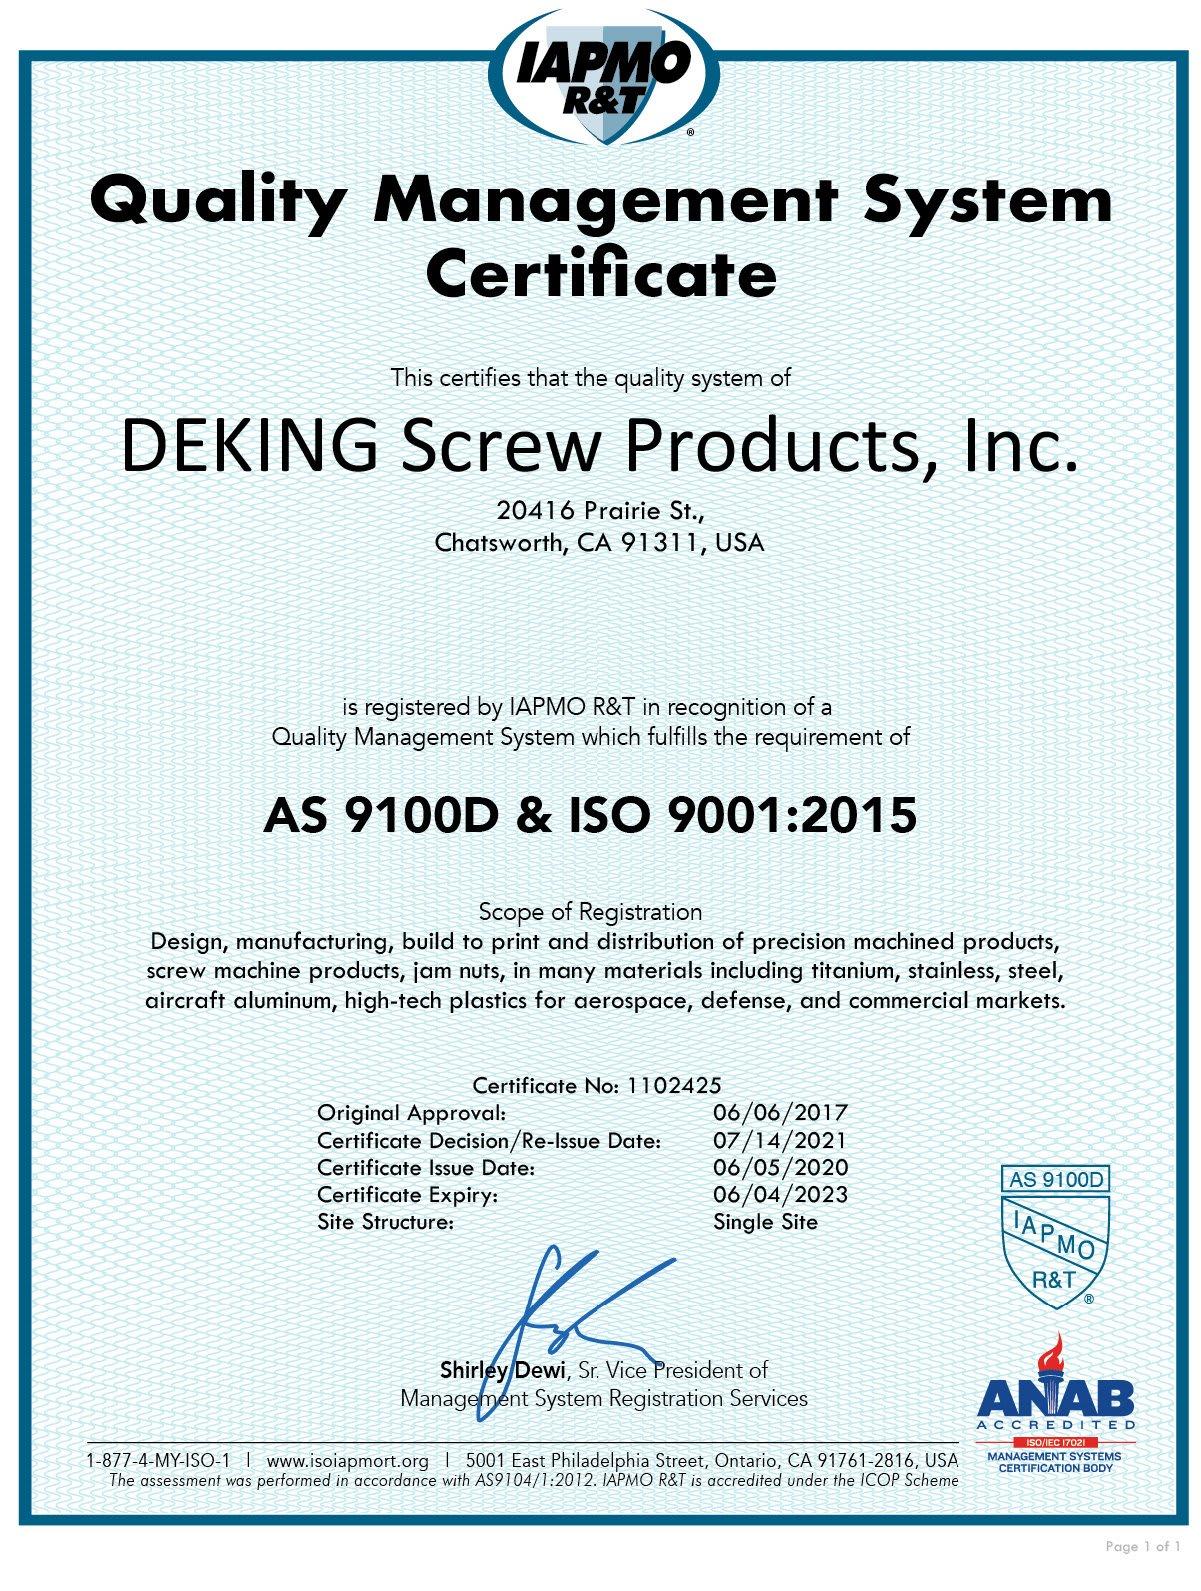 Deking-Screw-Products,-inc